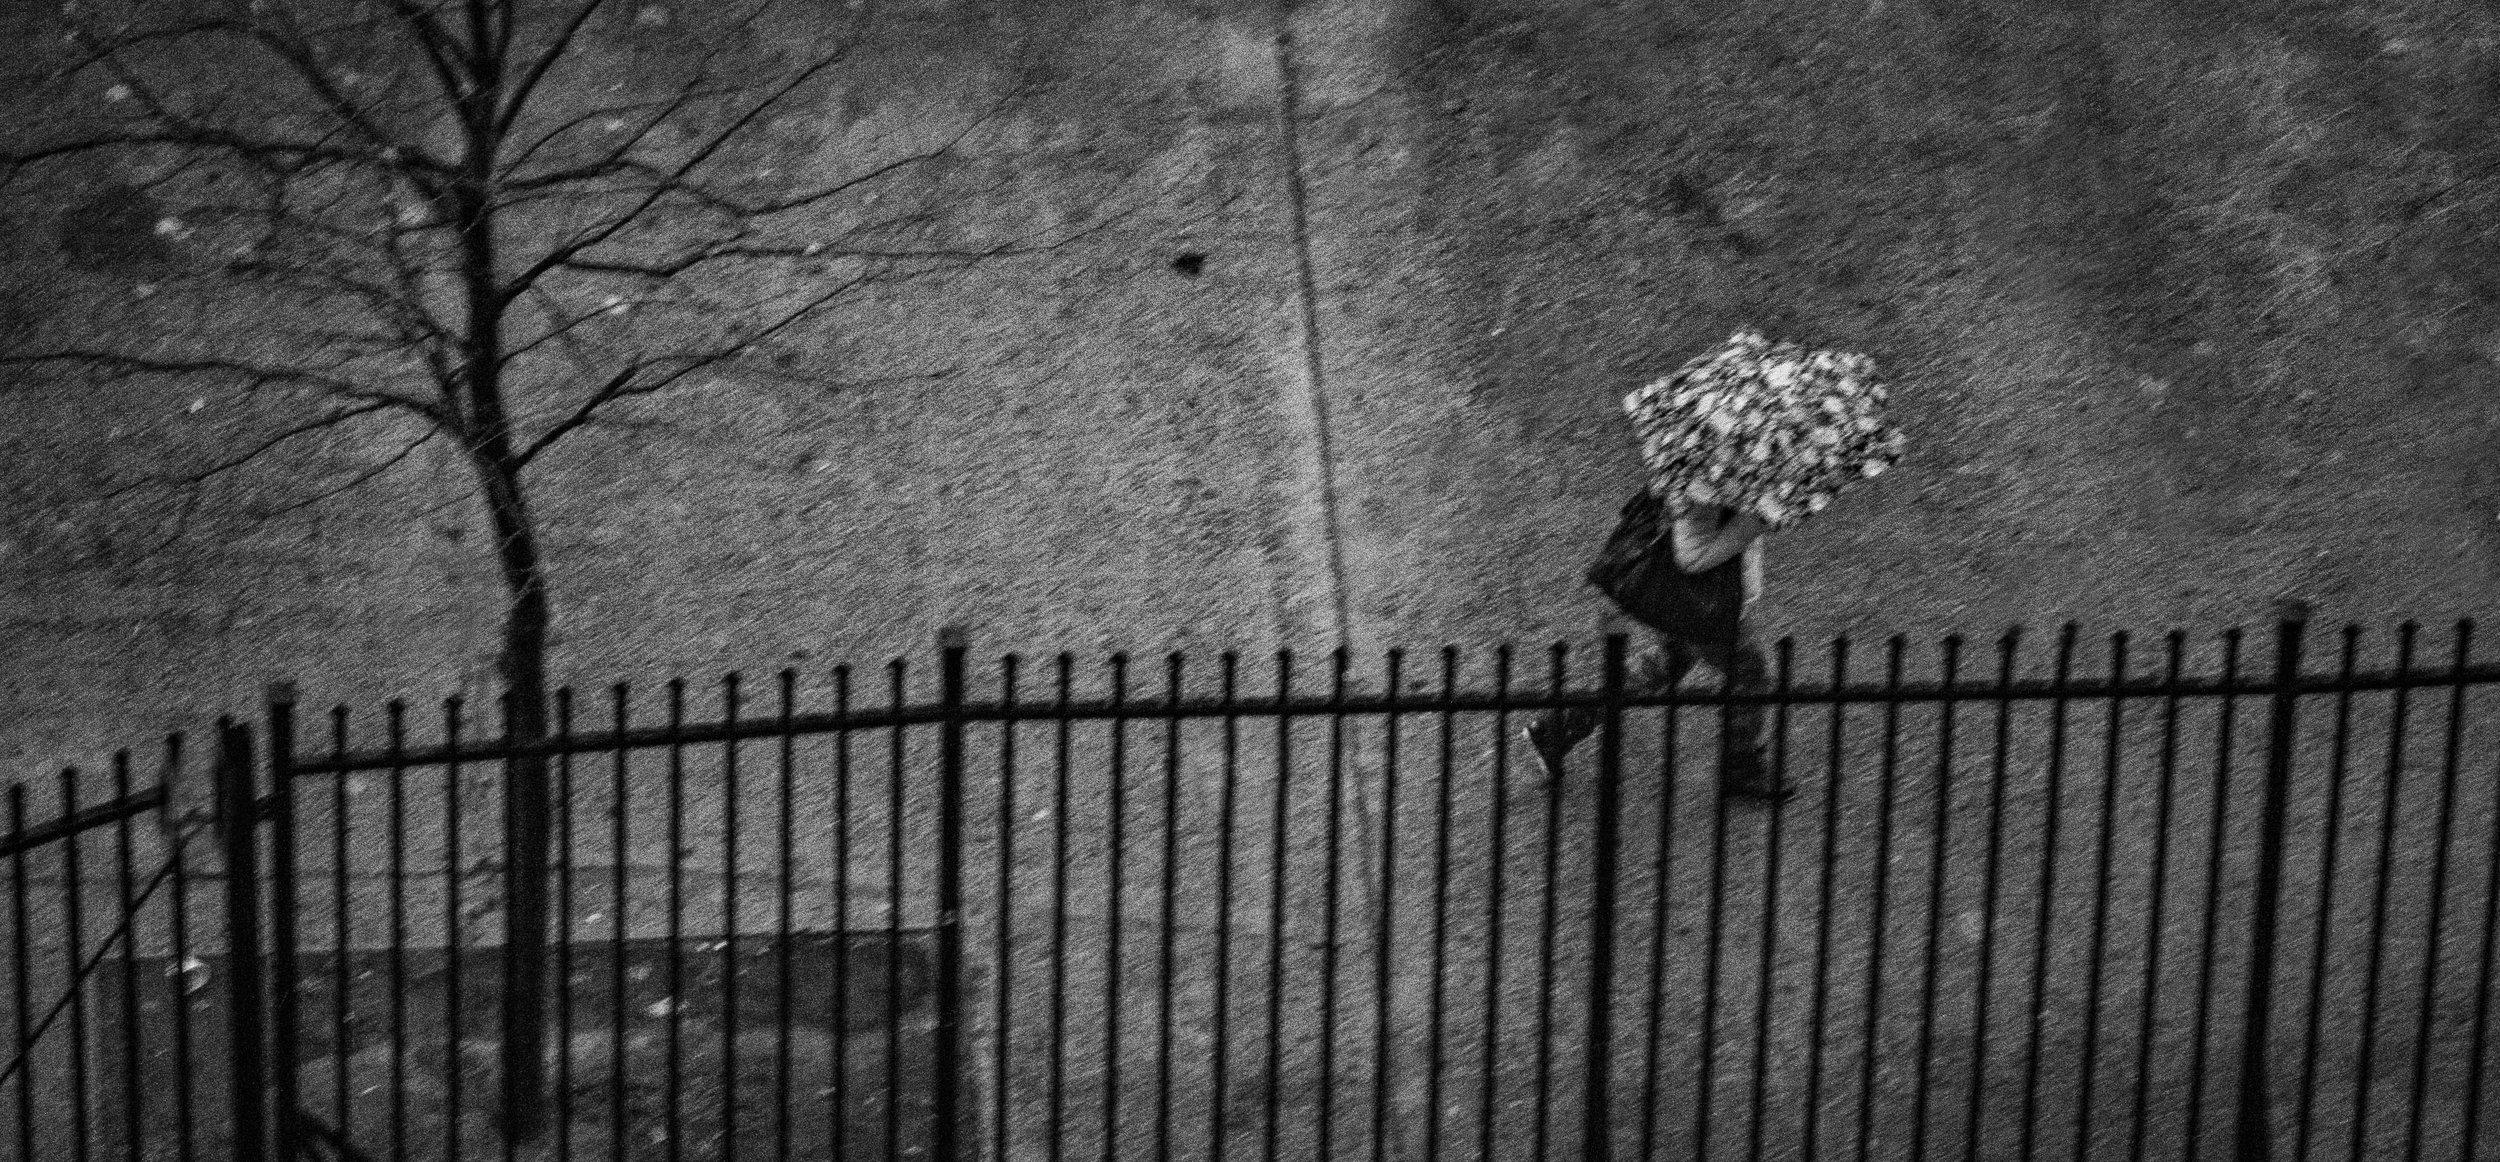 rainy day #1.JPG